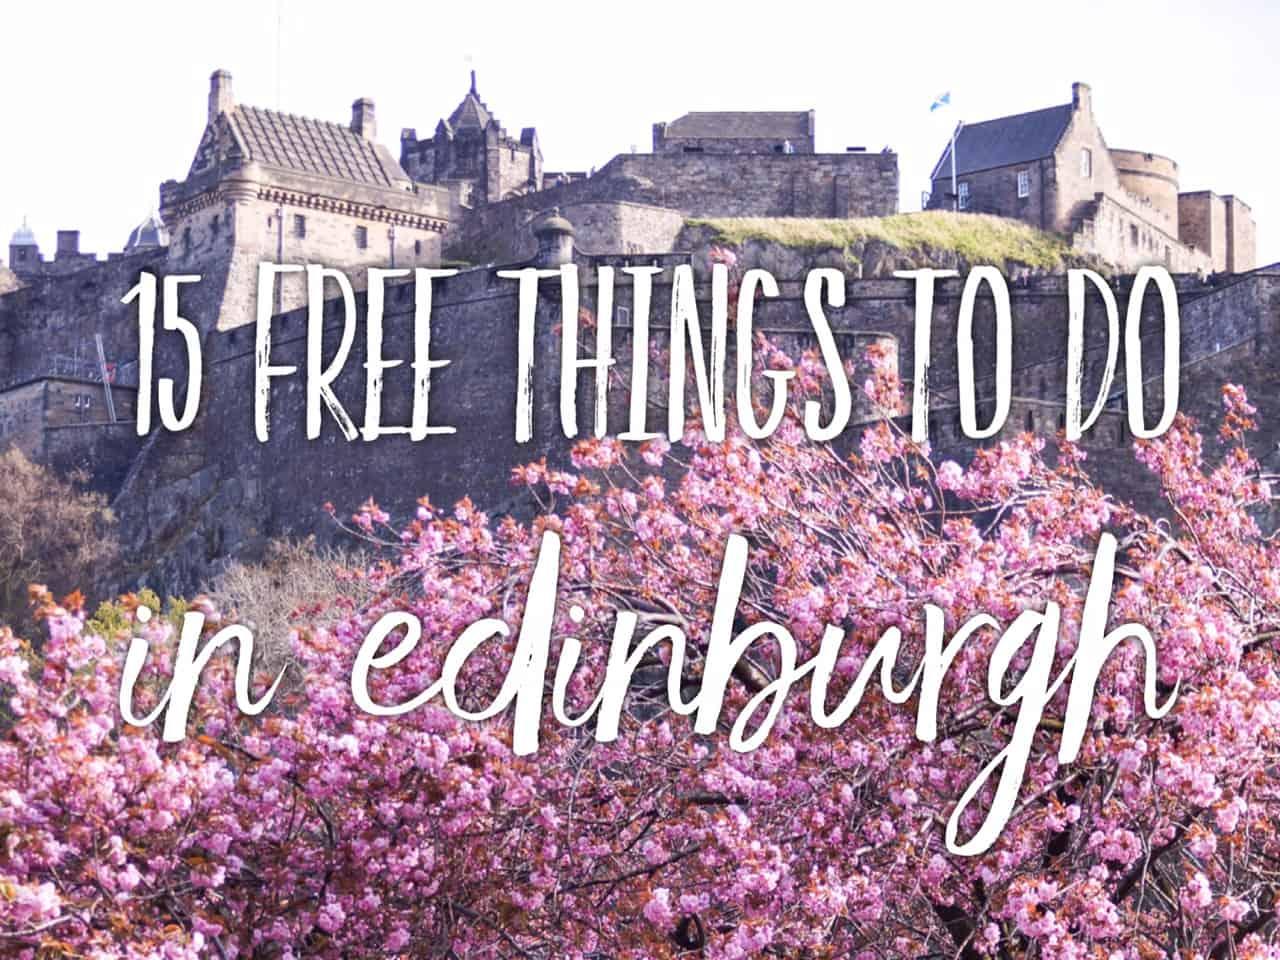 15 absolutely free things do in Edinburgh, Scotland